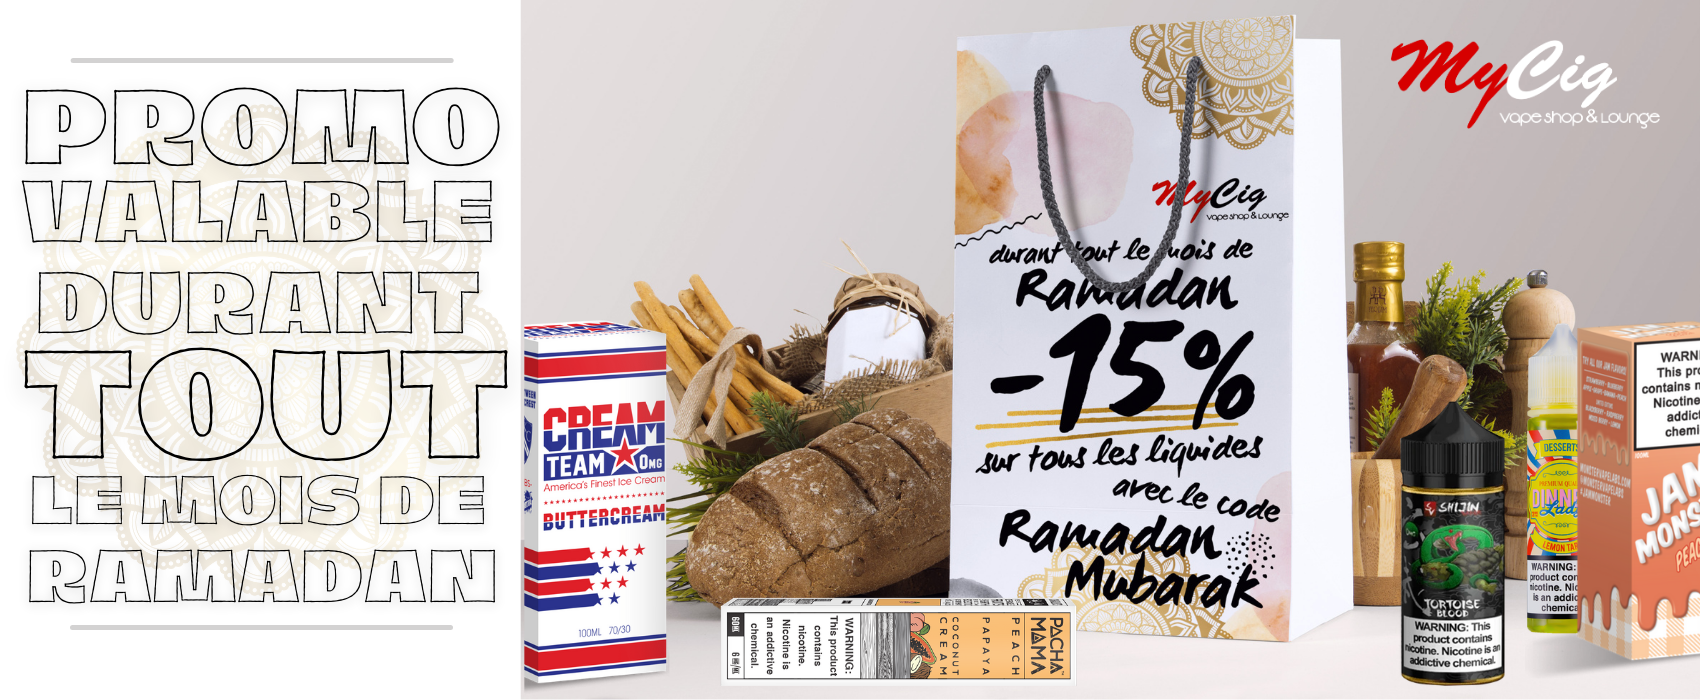 Promo Ramadan